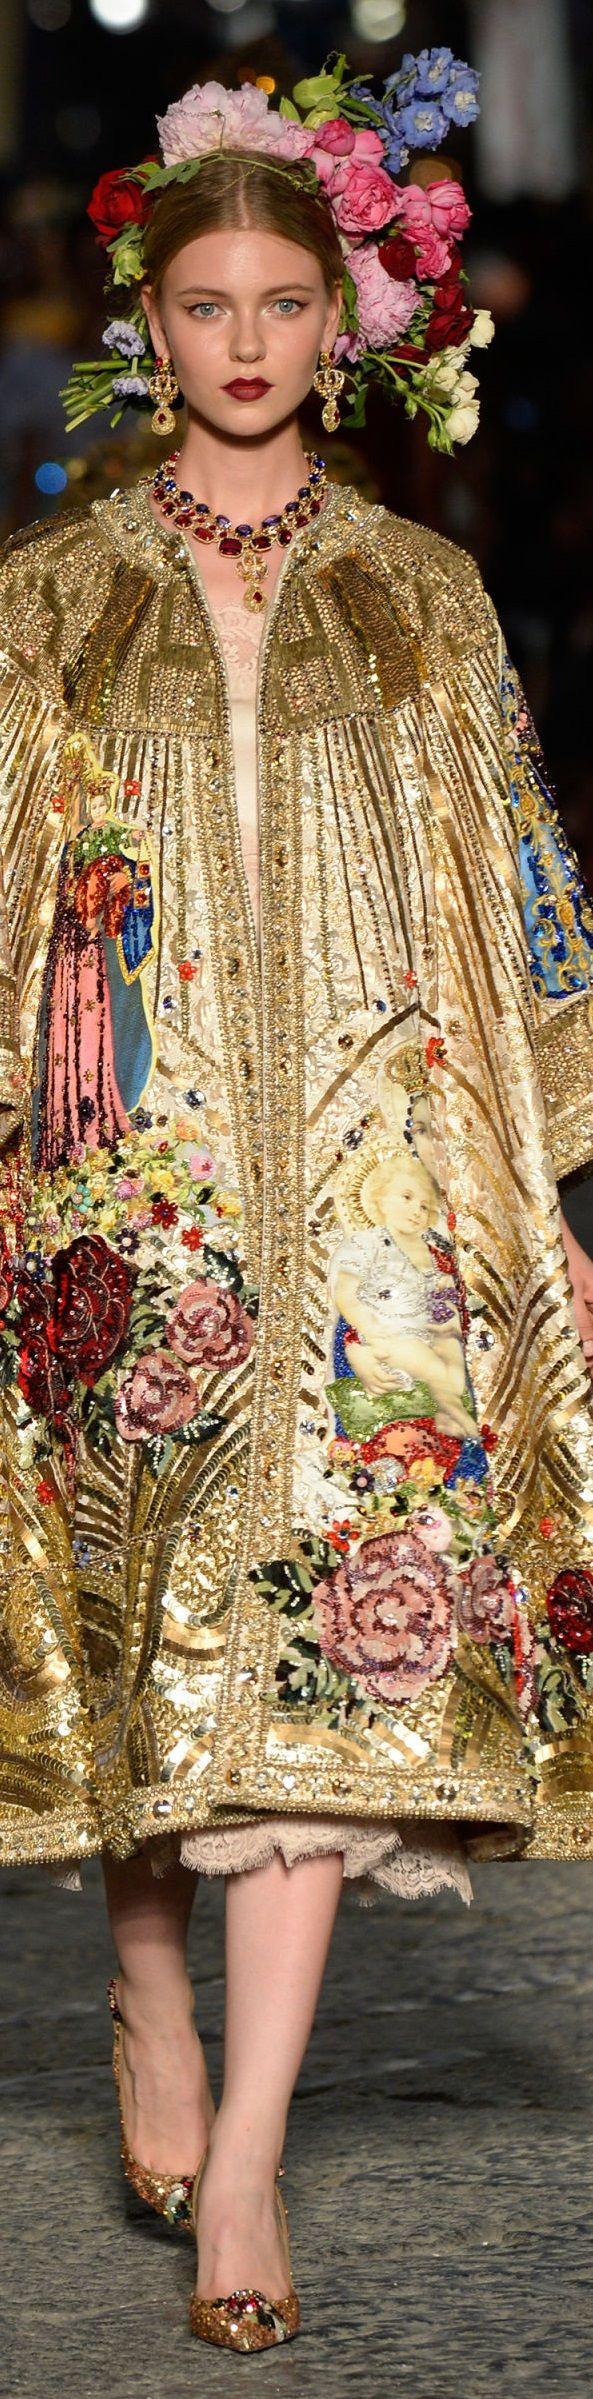 Dolce and Gabbana fall 2016 alta moda- couture